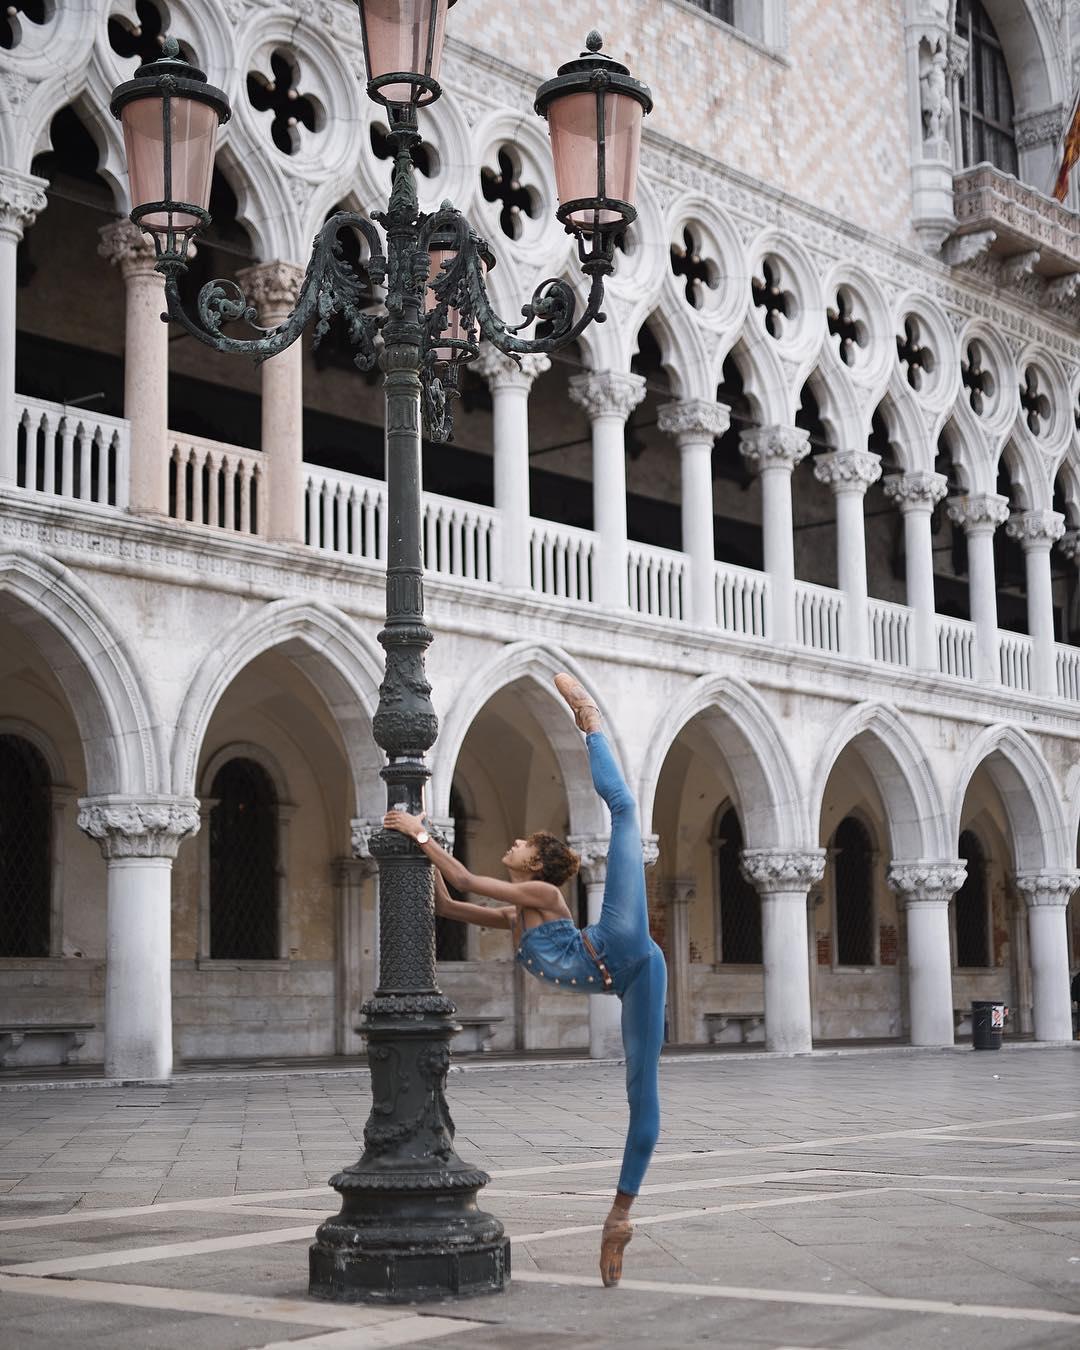 Волшебный мир балета на снимках Zachariah Epperson